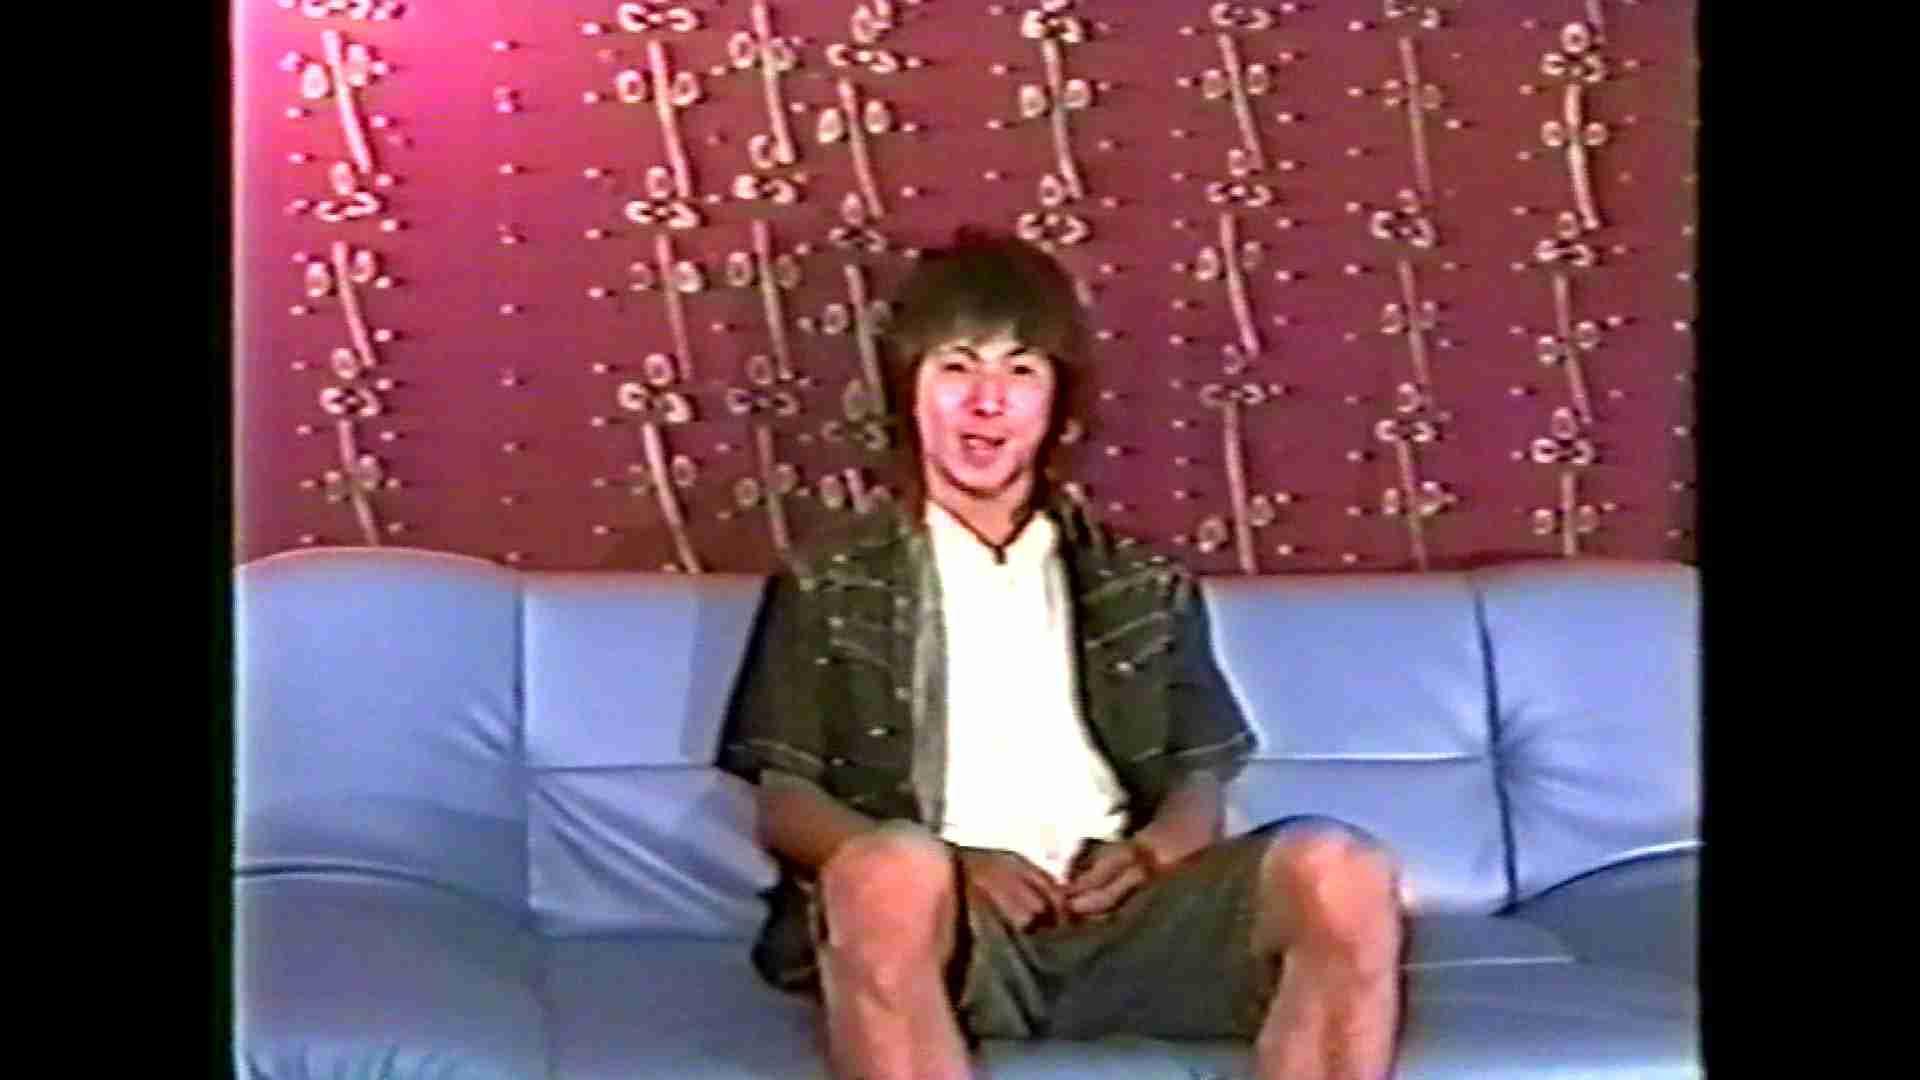 MADOKAさんのズリネタコレクションVol.3-1 名作・話題作 | オムニバス  101pic 6